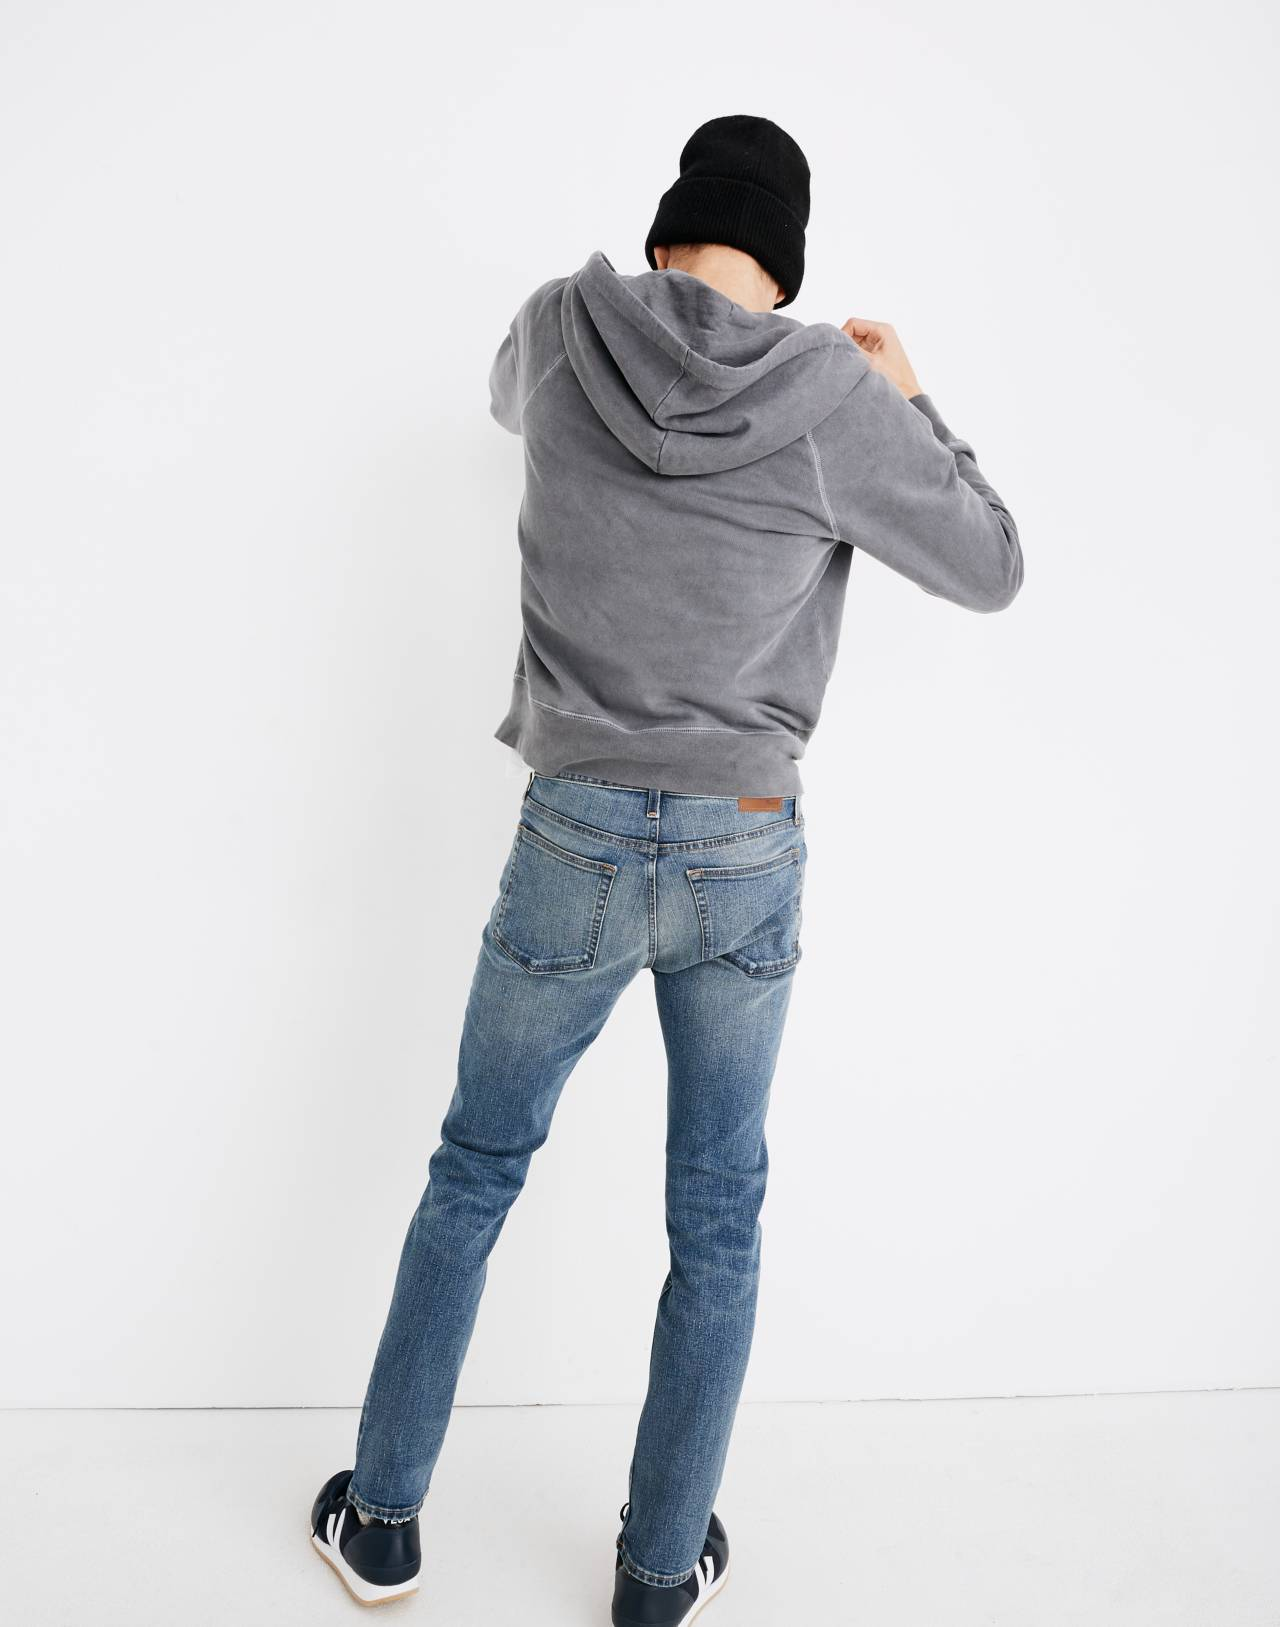 Slim Jeans in Danforth Wash in danforth wash image 1